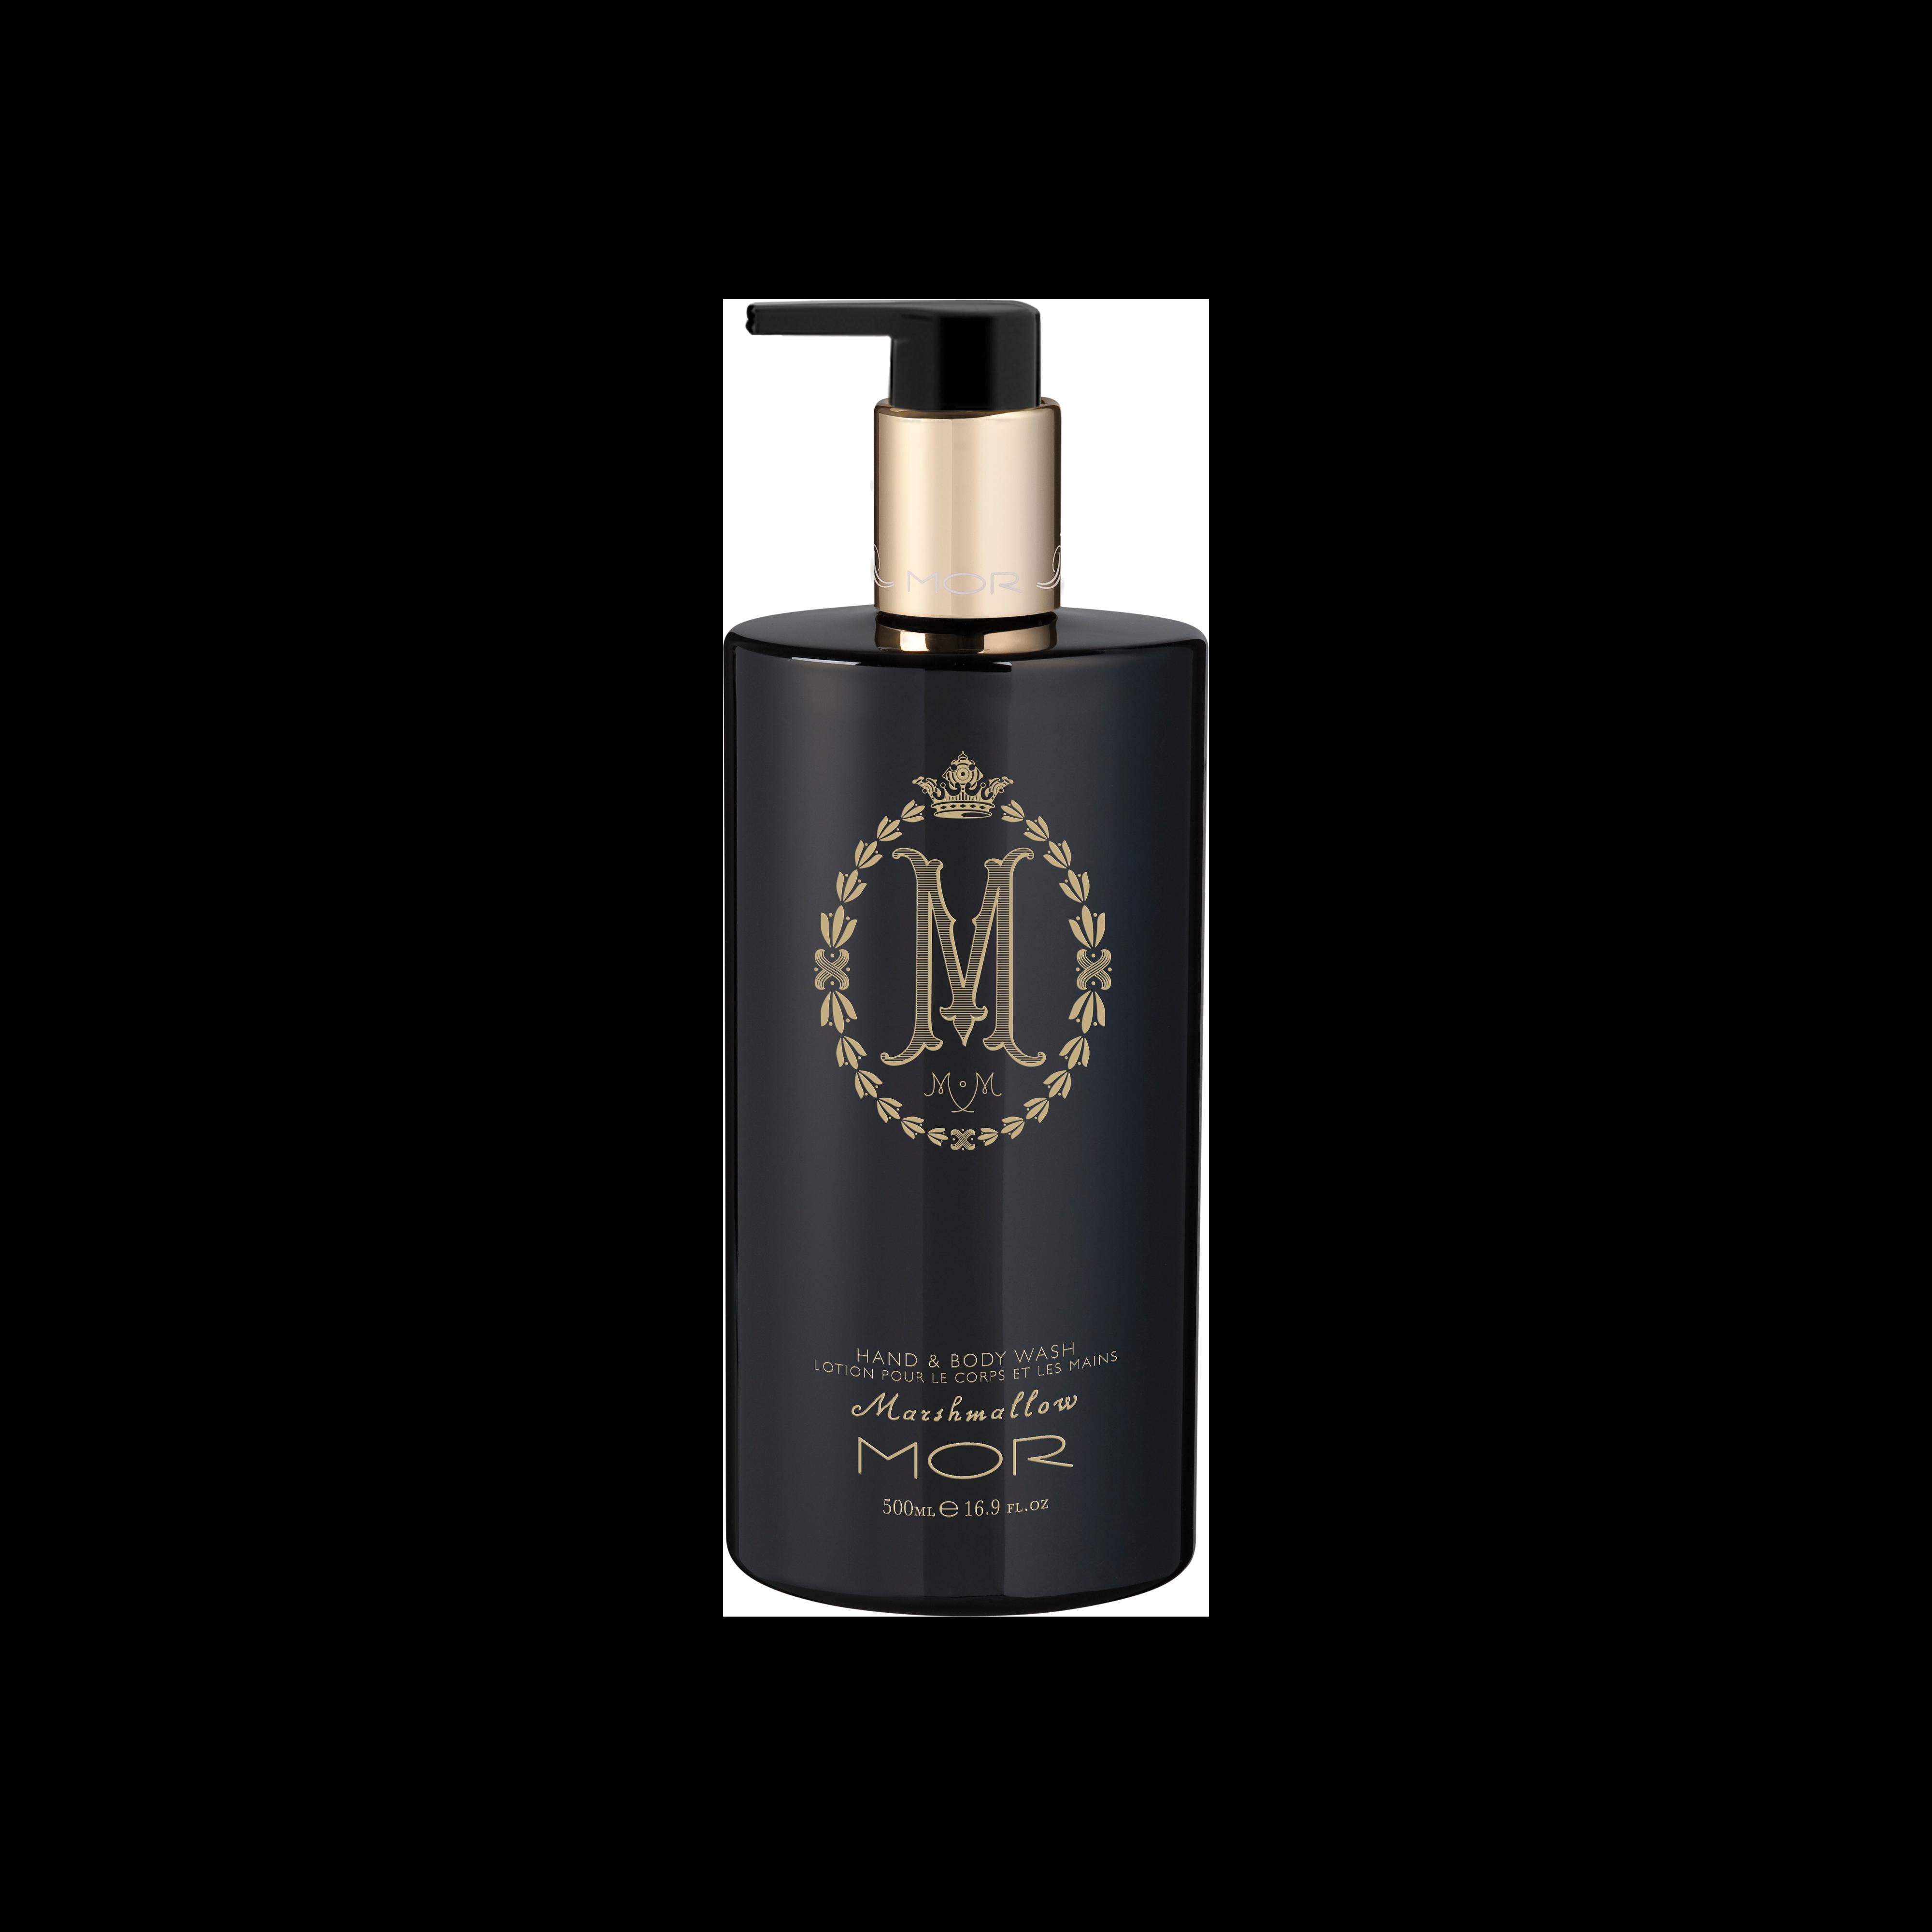 Marshmallow Hand & Body Wash 500ml